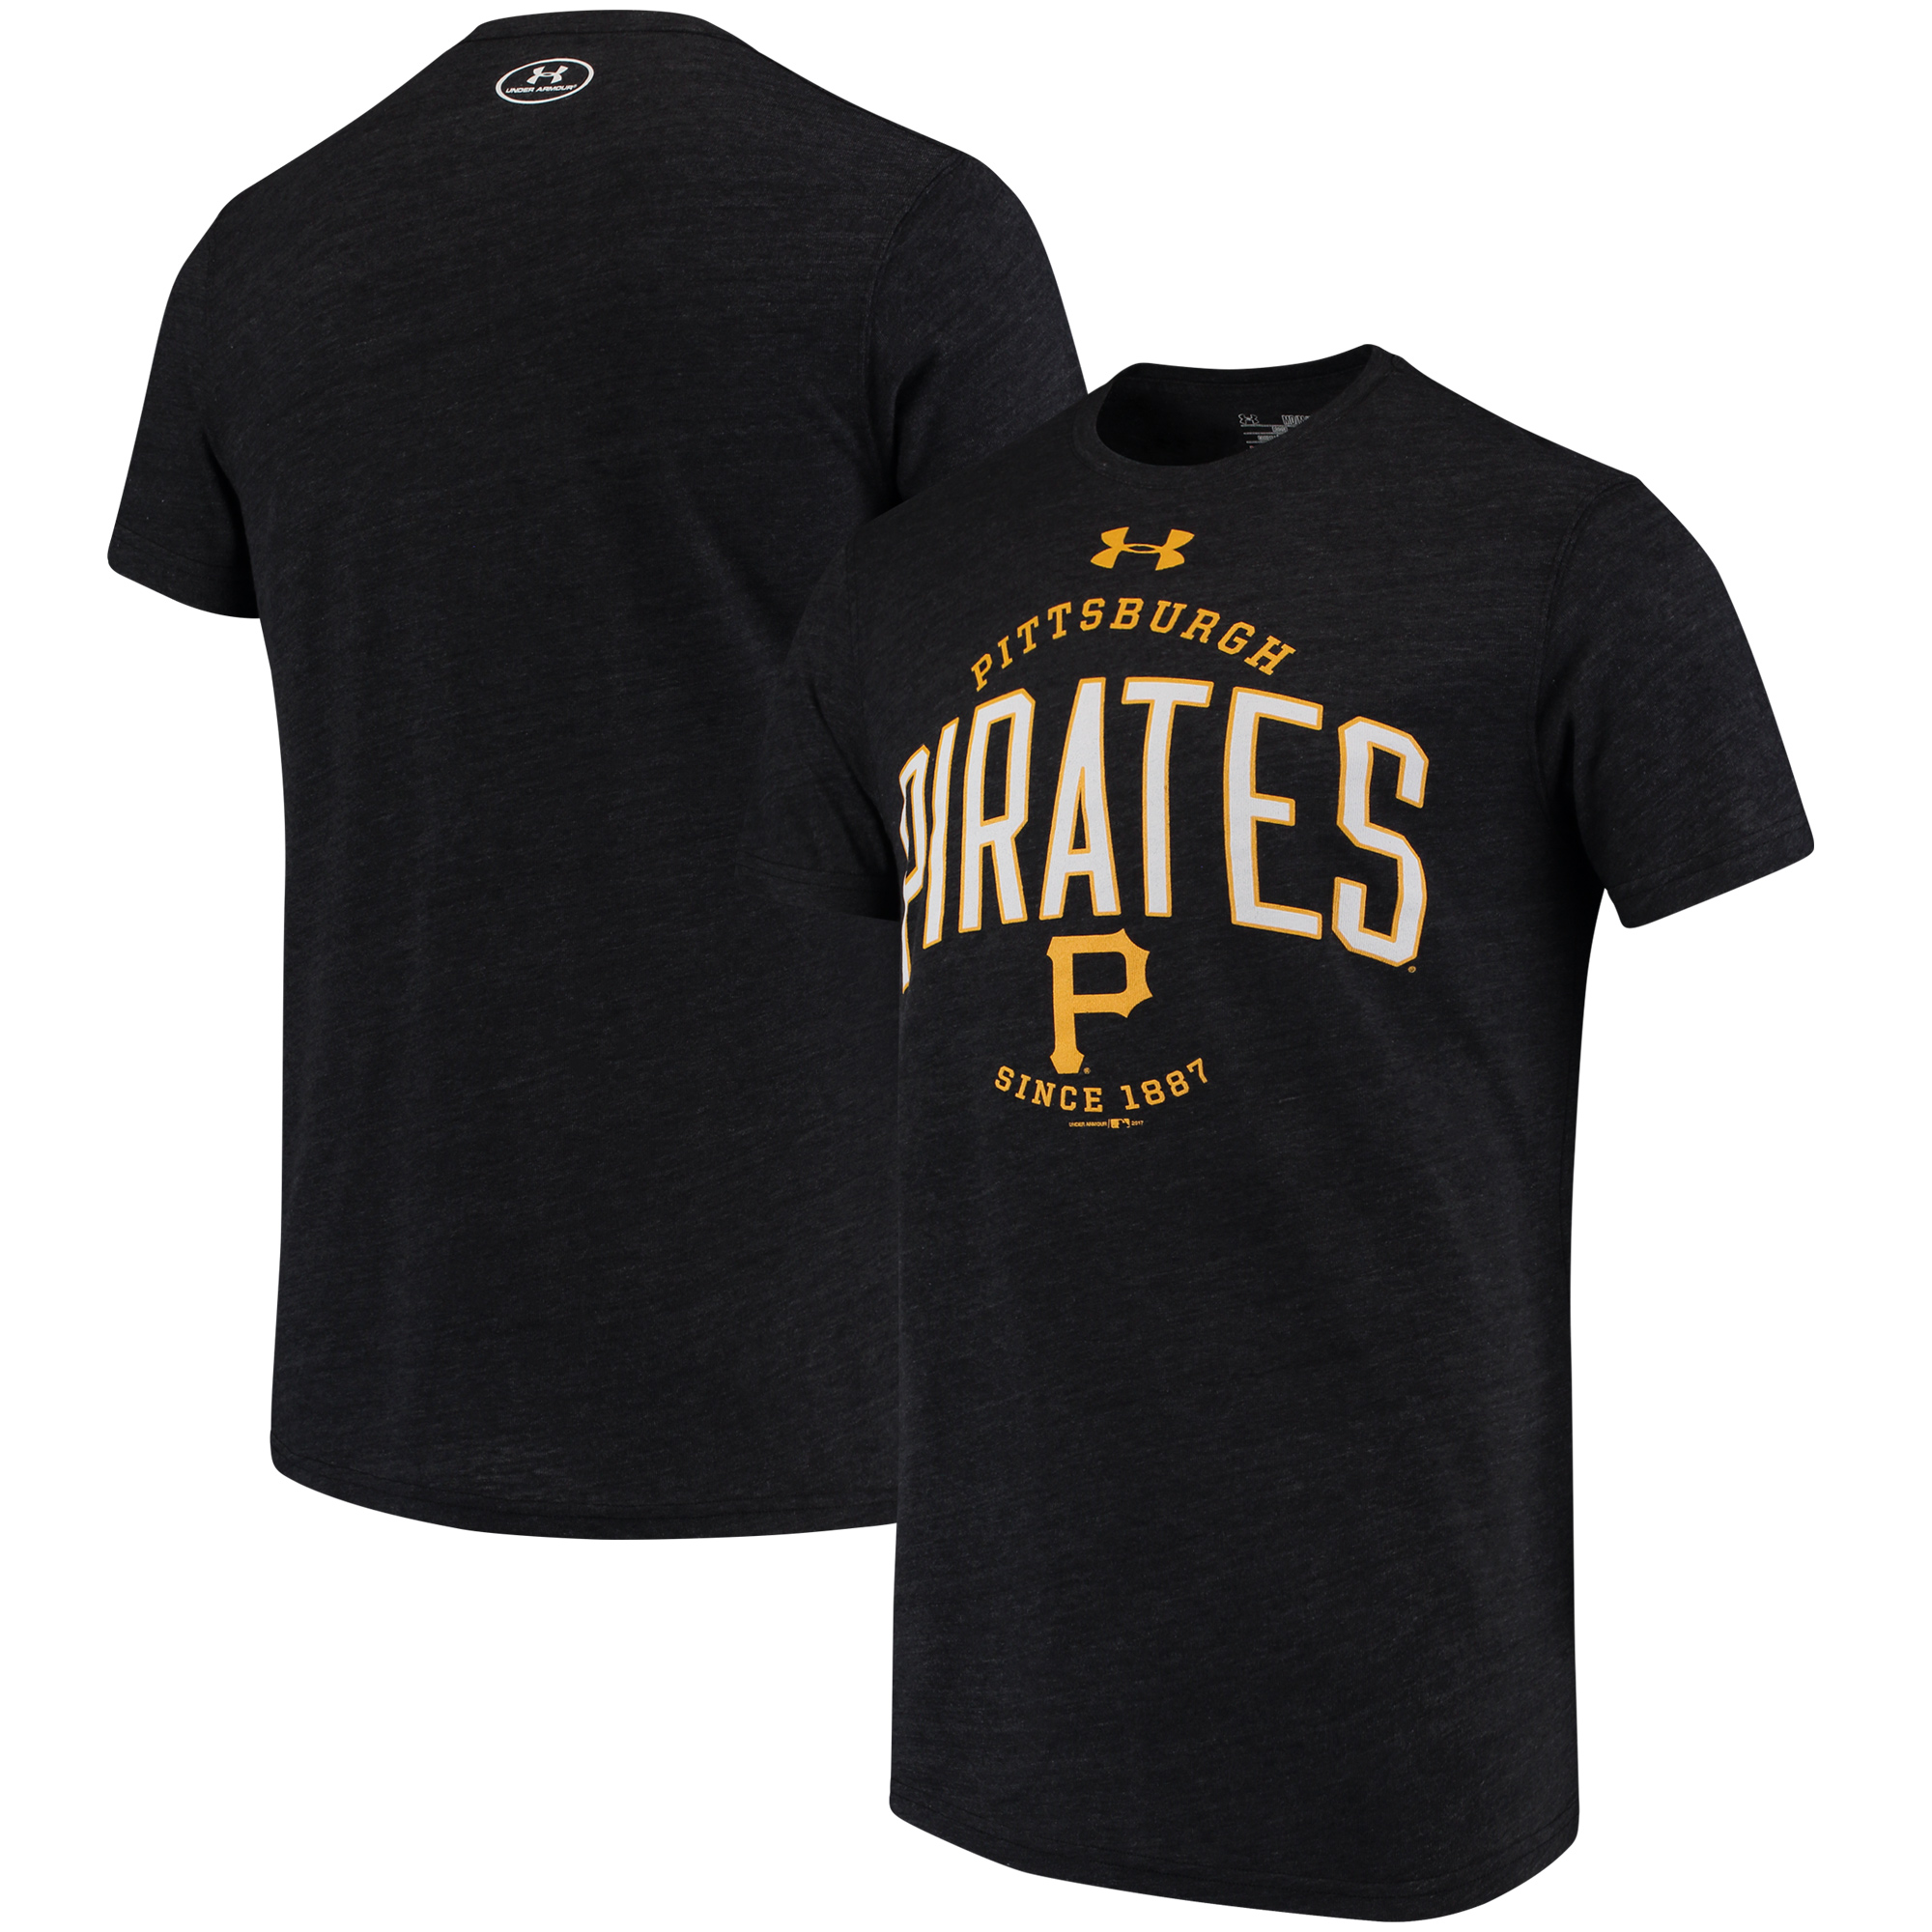 Pittsburgh Pirates Under Armour Team Logo Tri-Blend T-Shirt - Black